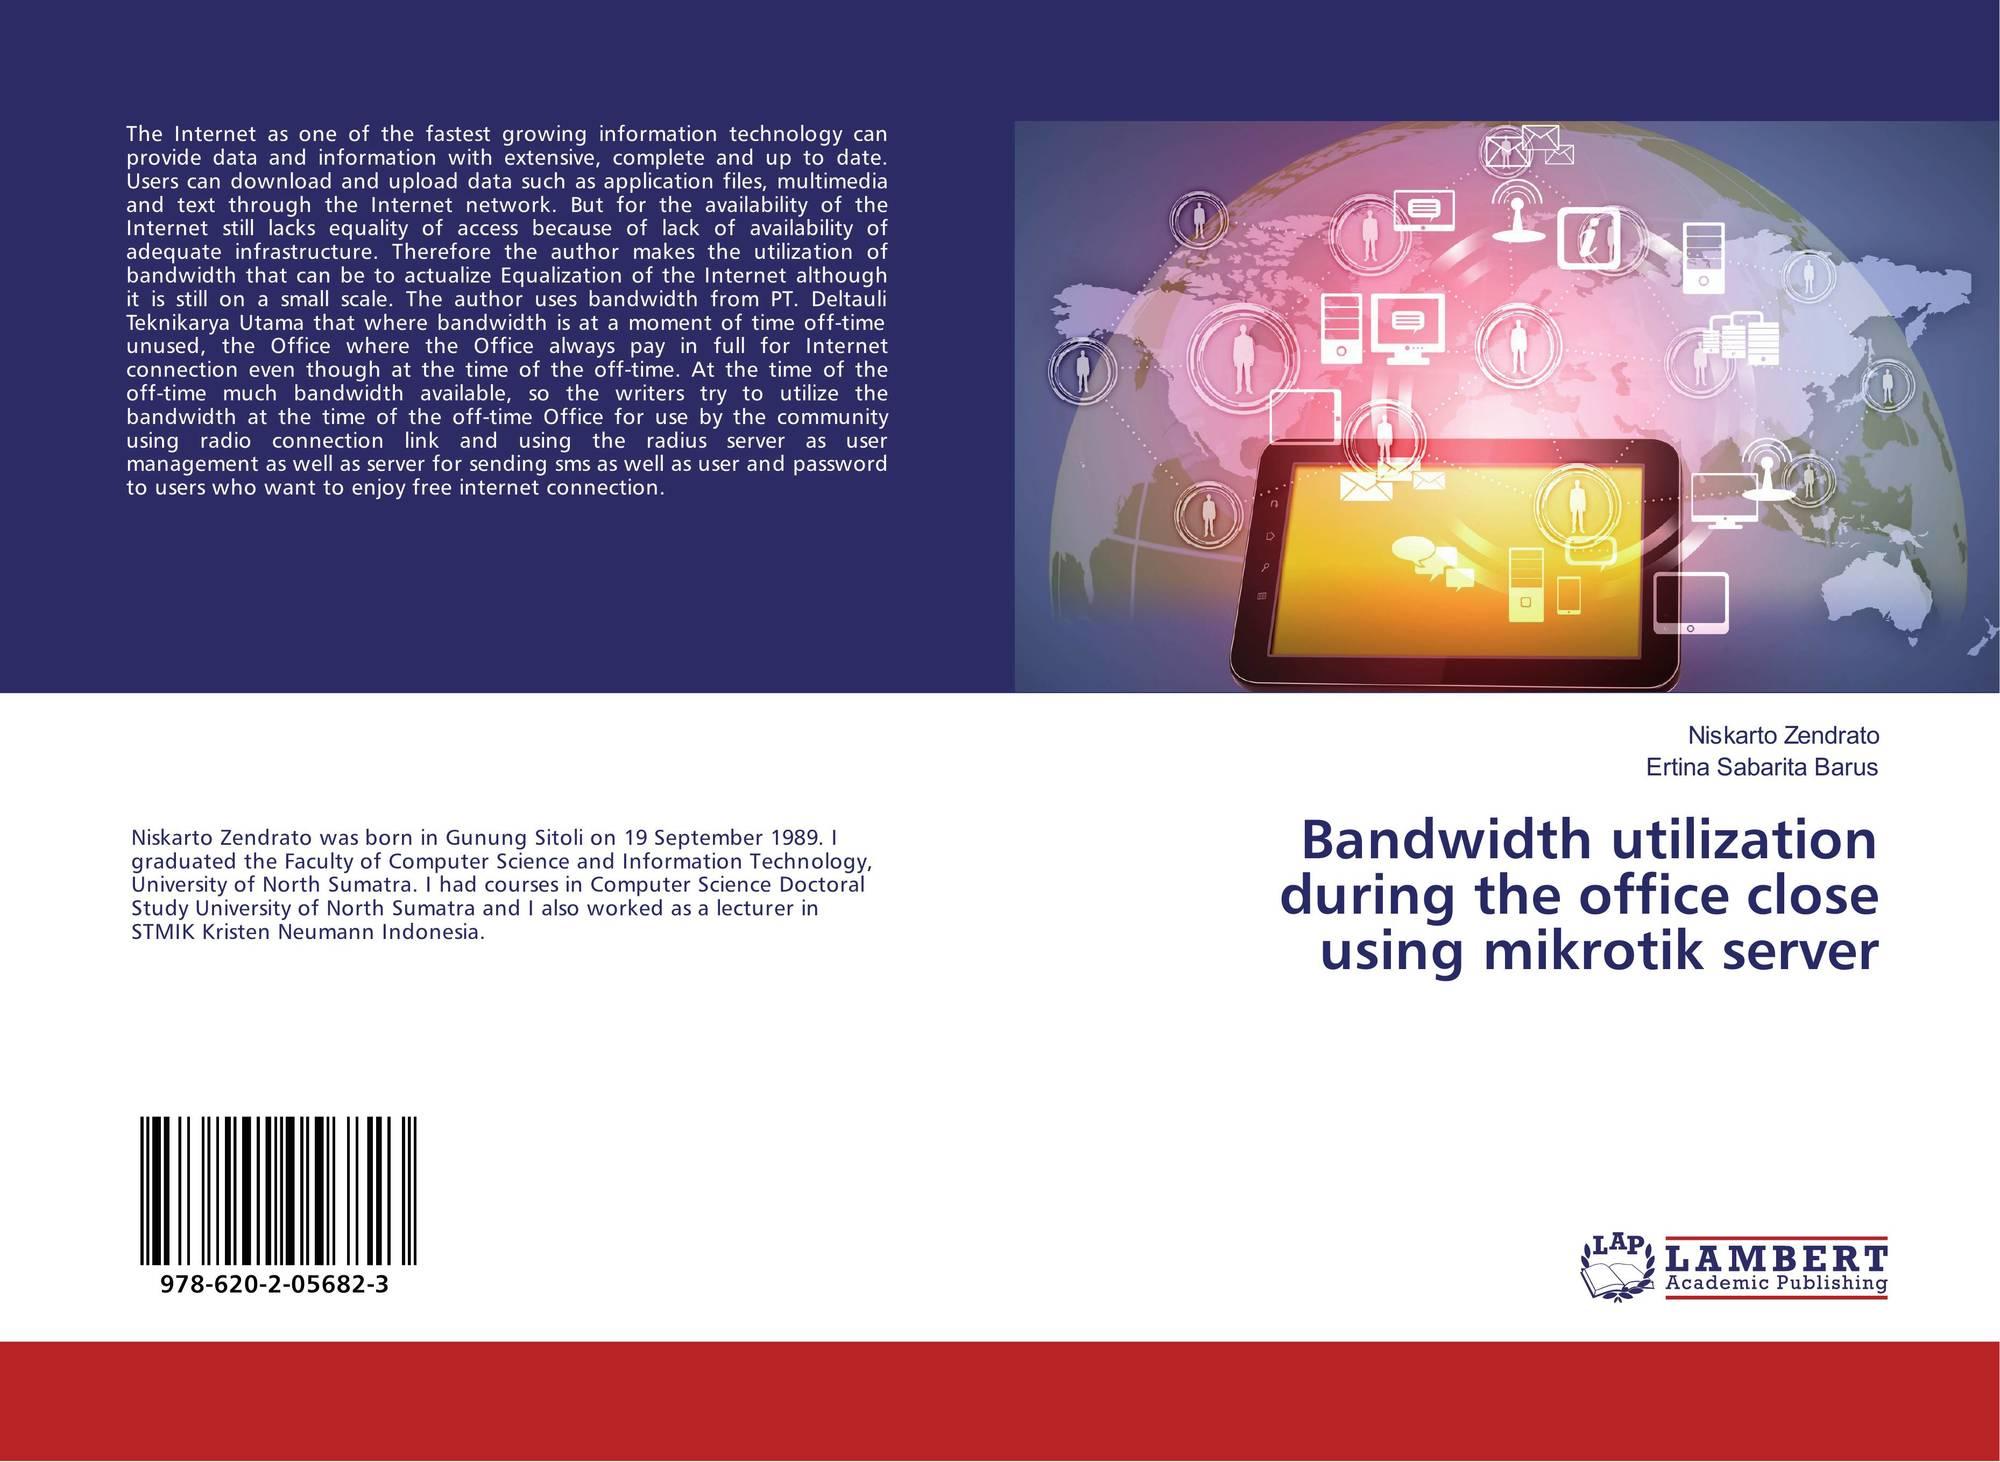 Bandwidth utilization during the office close using mikrotik server